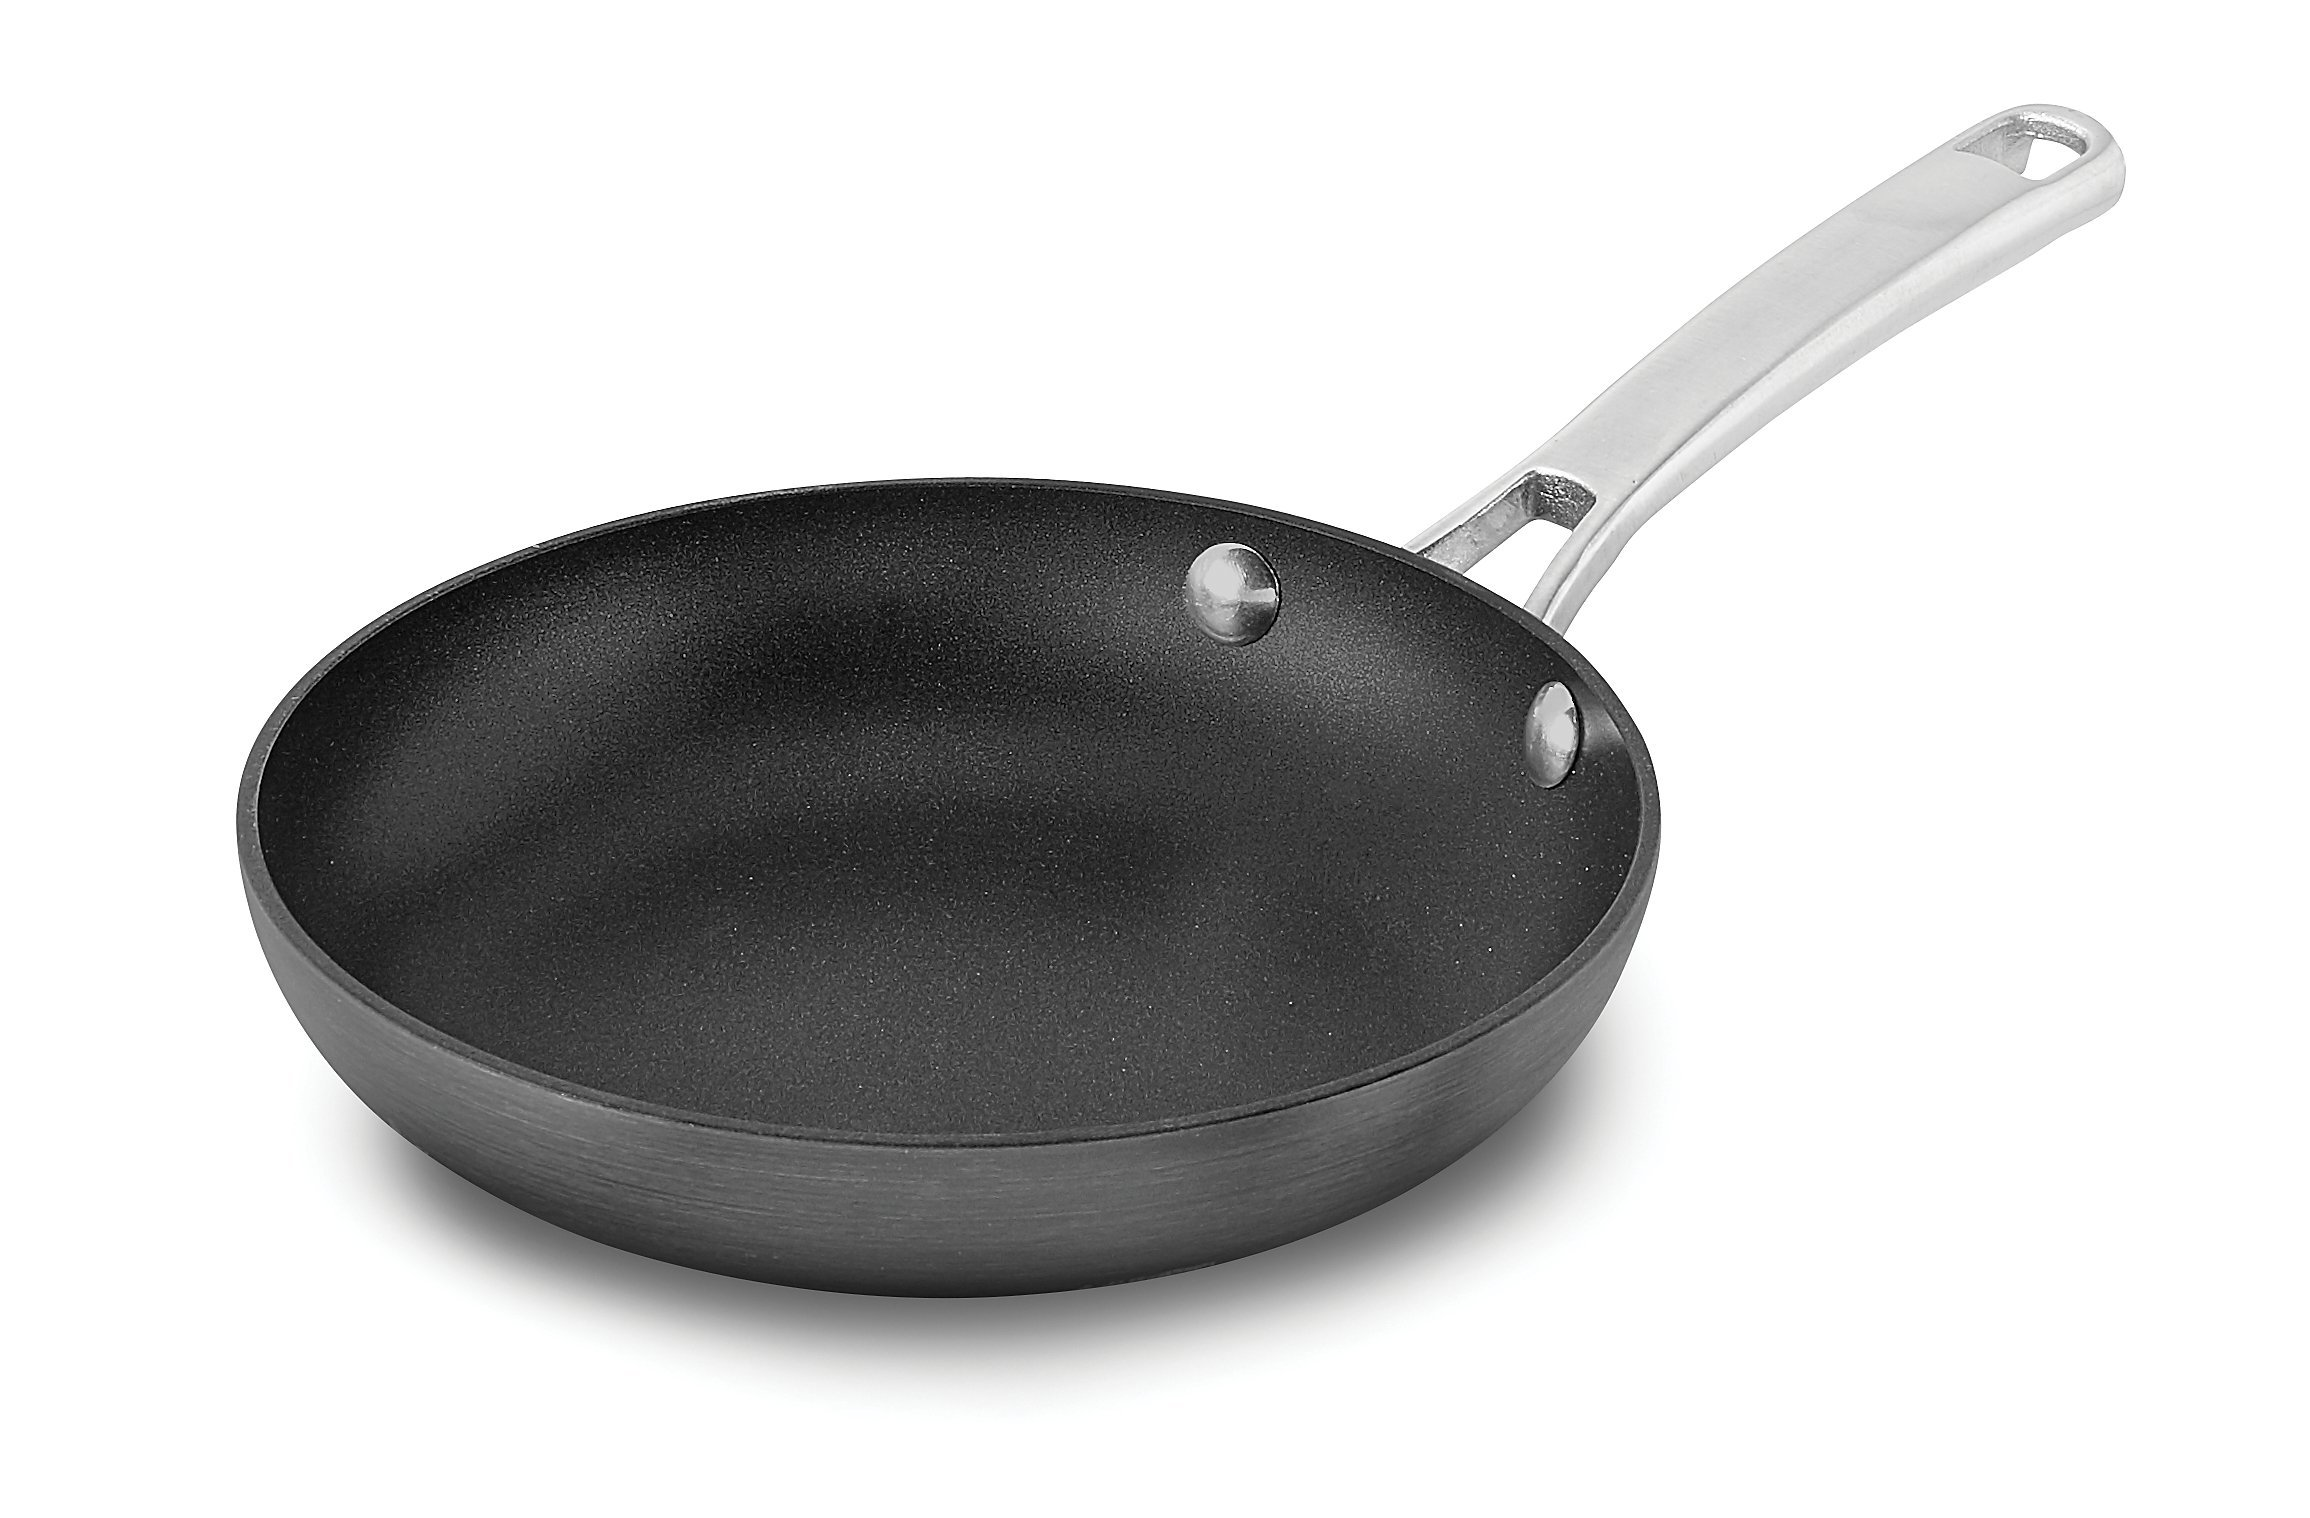 Calphalon 1934149 Classic Nonstick Omelet Fry Pan, 8 inch, Grey by Calphalon